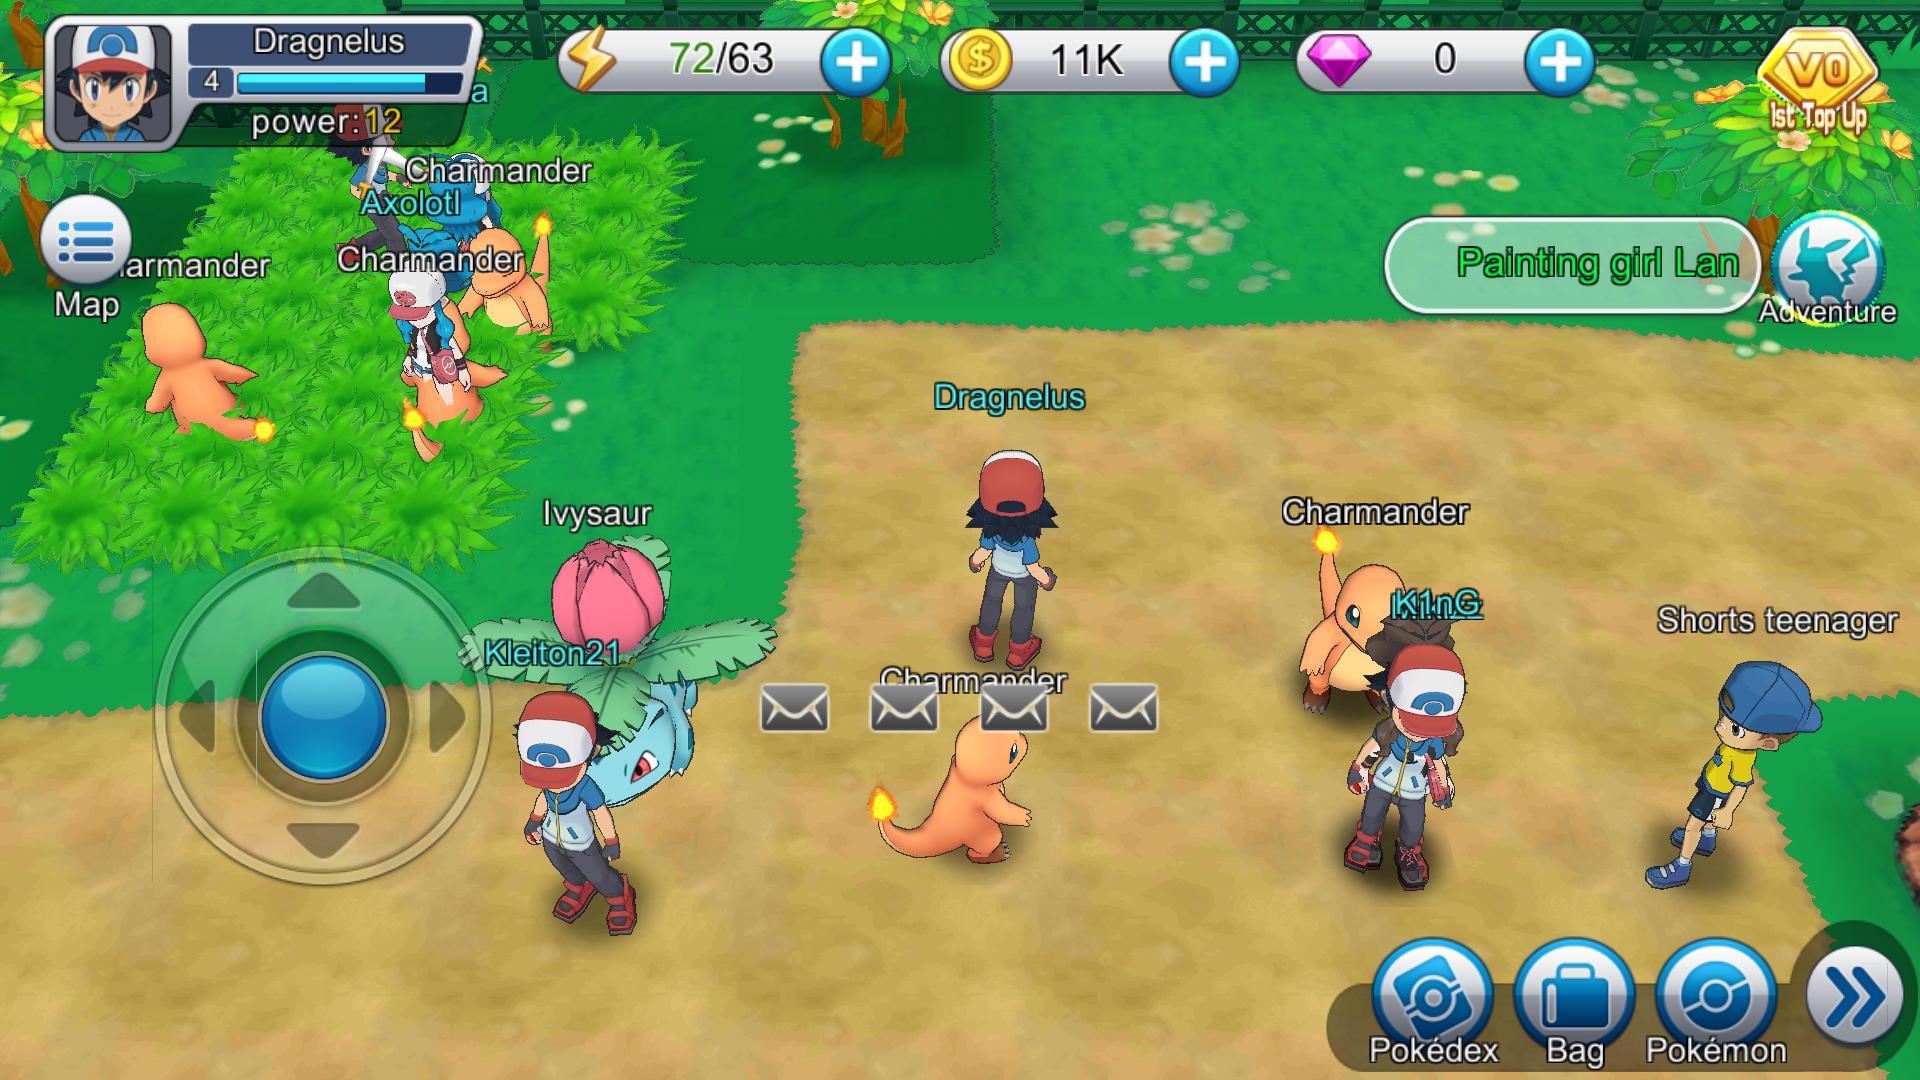 new pokemon mmorpg on mobile mmorpg com forums